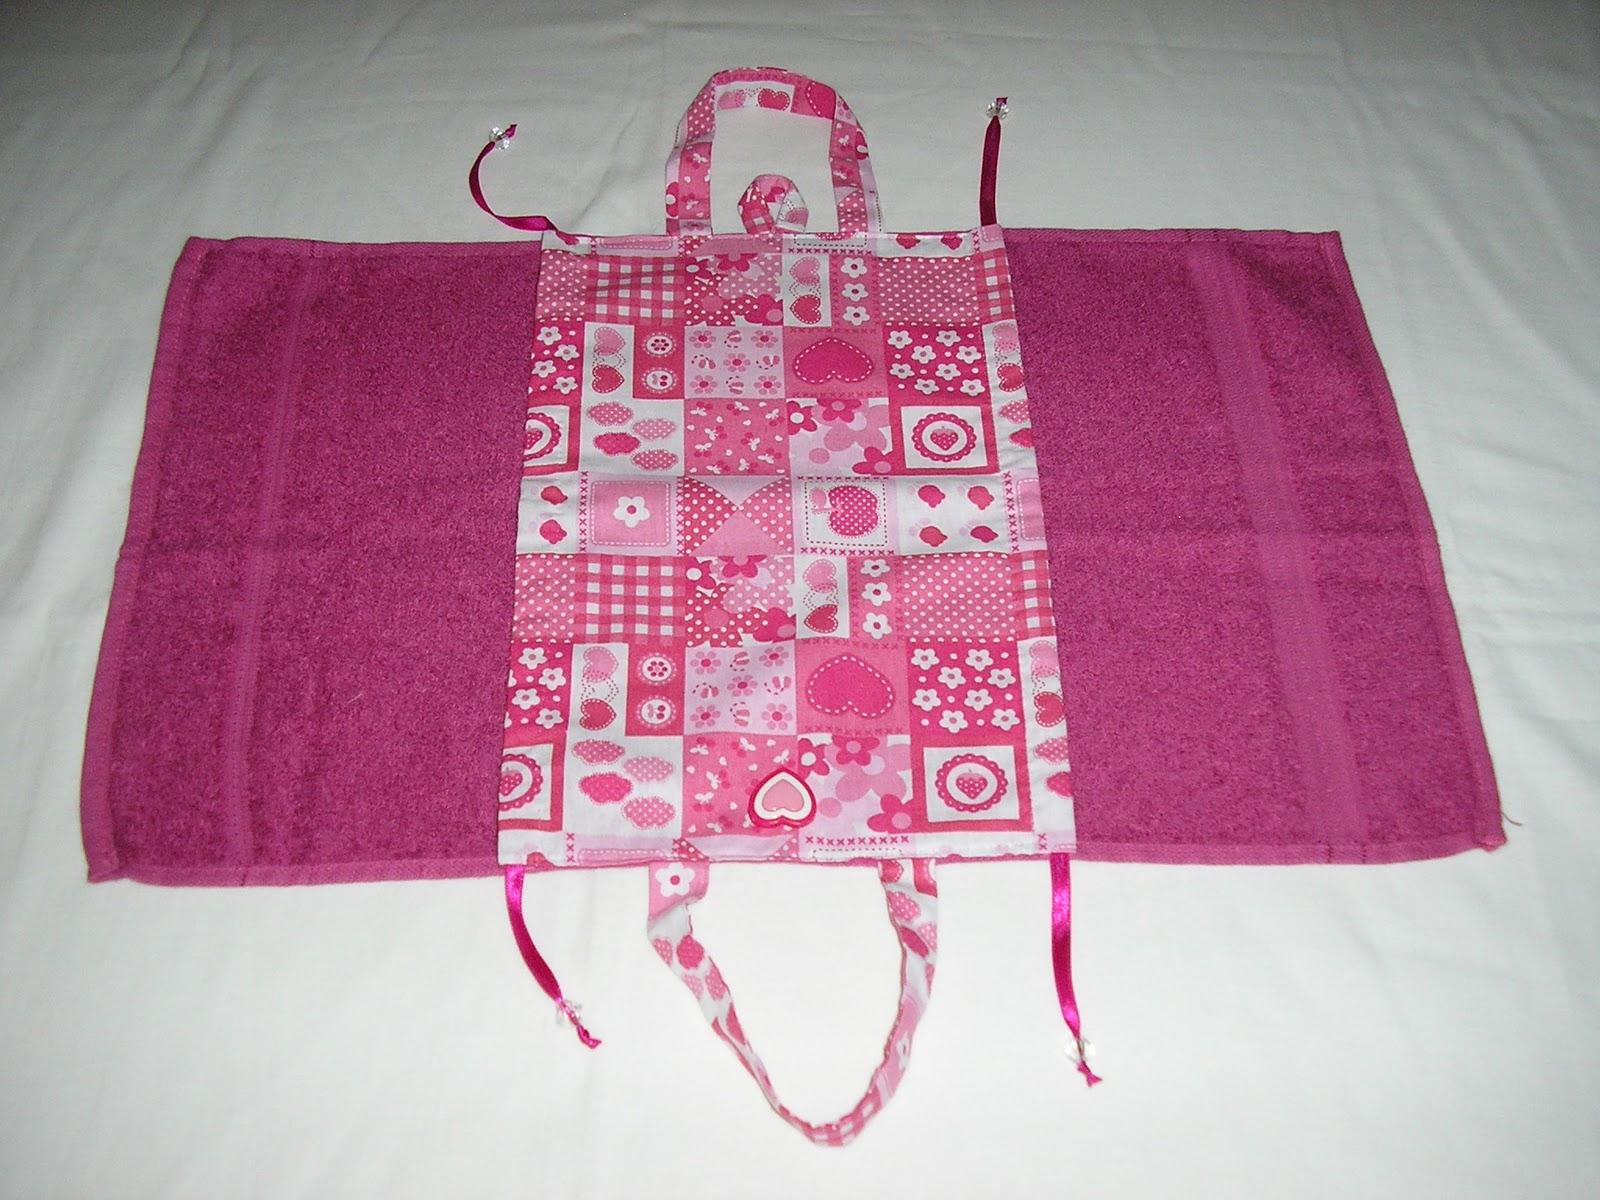 Aparador Barba Worten ~ Bolsa toalha u2013 Artesanato na Rede